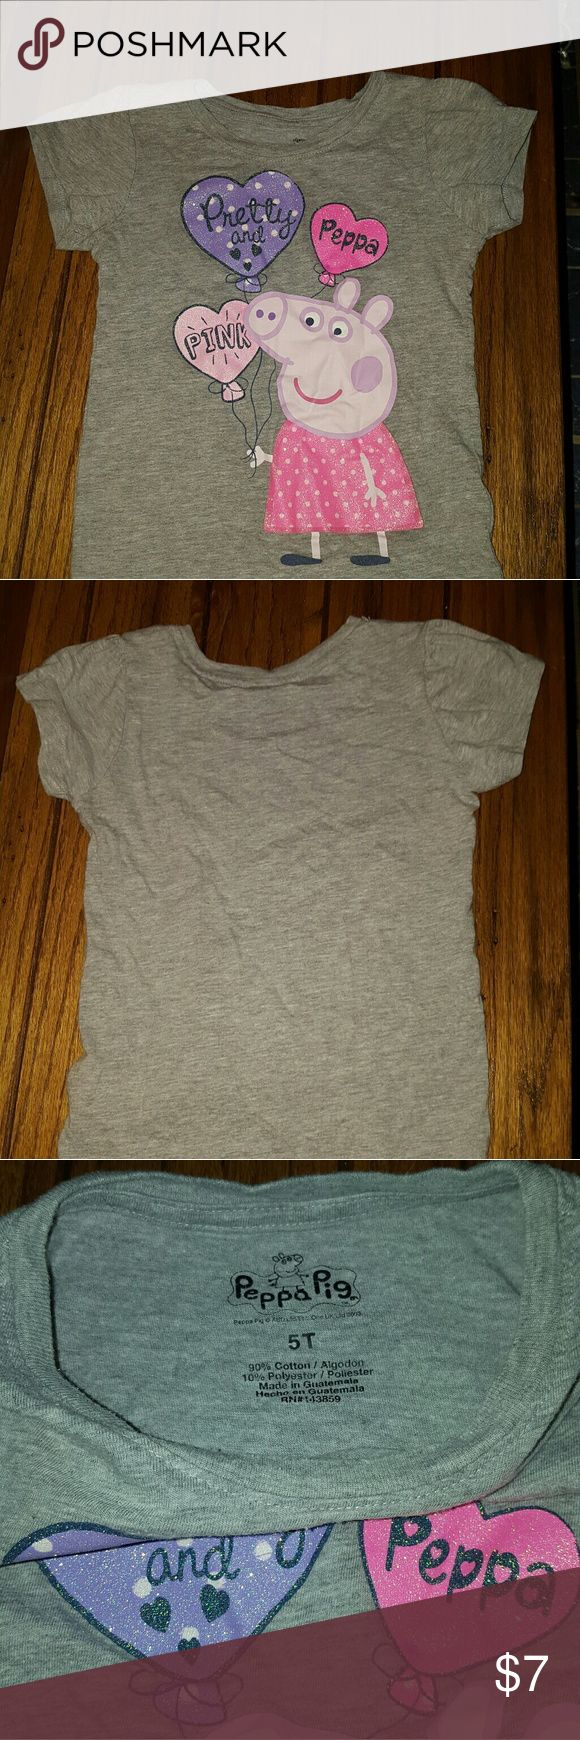 Peppa Pig Girls Shirt Size 5T Previously enjoyed.   Size 5T Peppa Pig girls shirt. Peppa Pig Shirts & Tops Tees - Short Sleeve